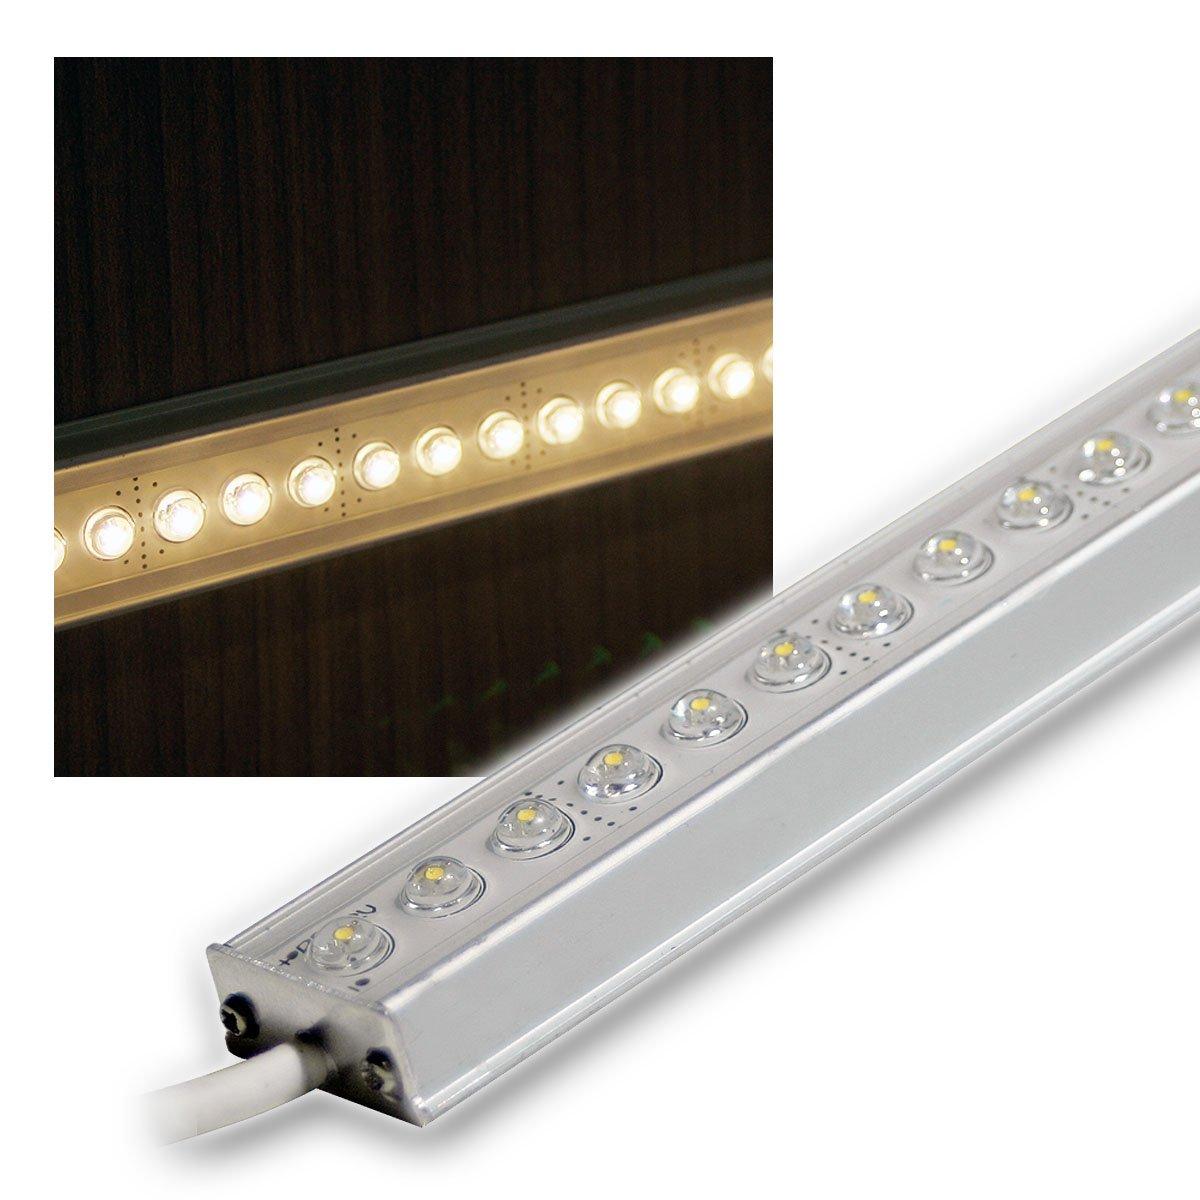 ALU LED Lichtleiste warm-weiß 25cm 12V DC DESIGN: Amazon.de: Beleuchtung